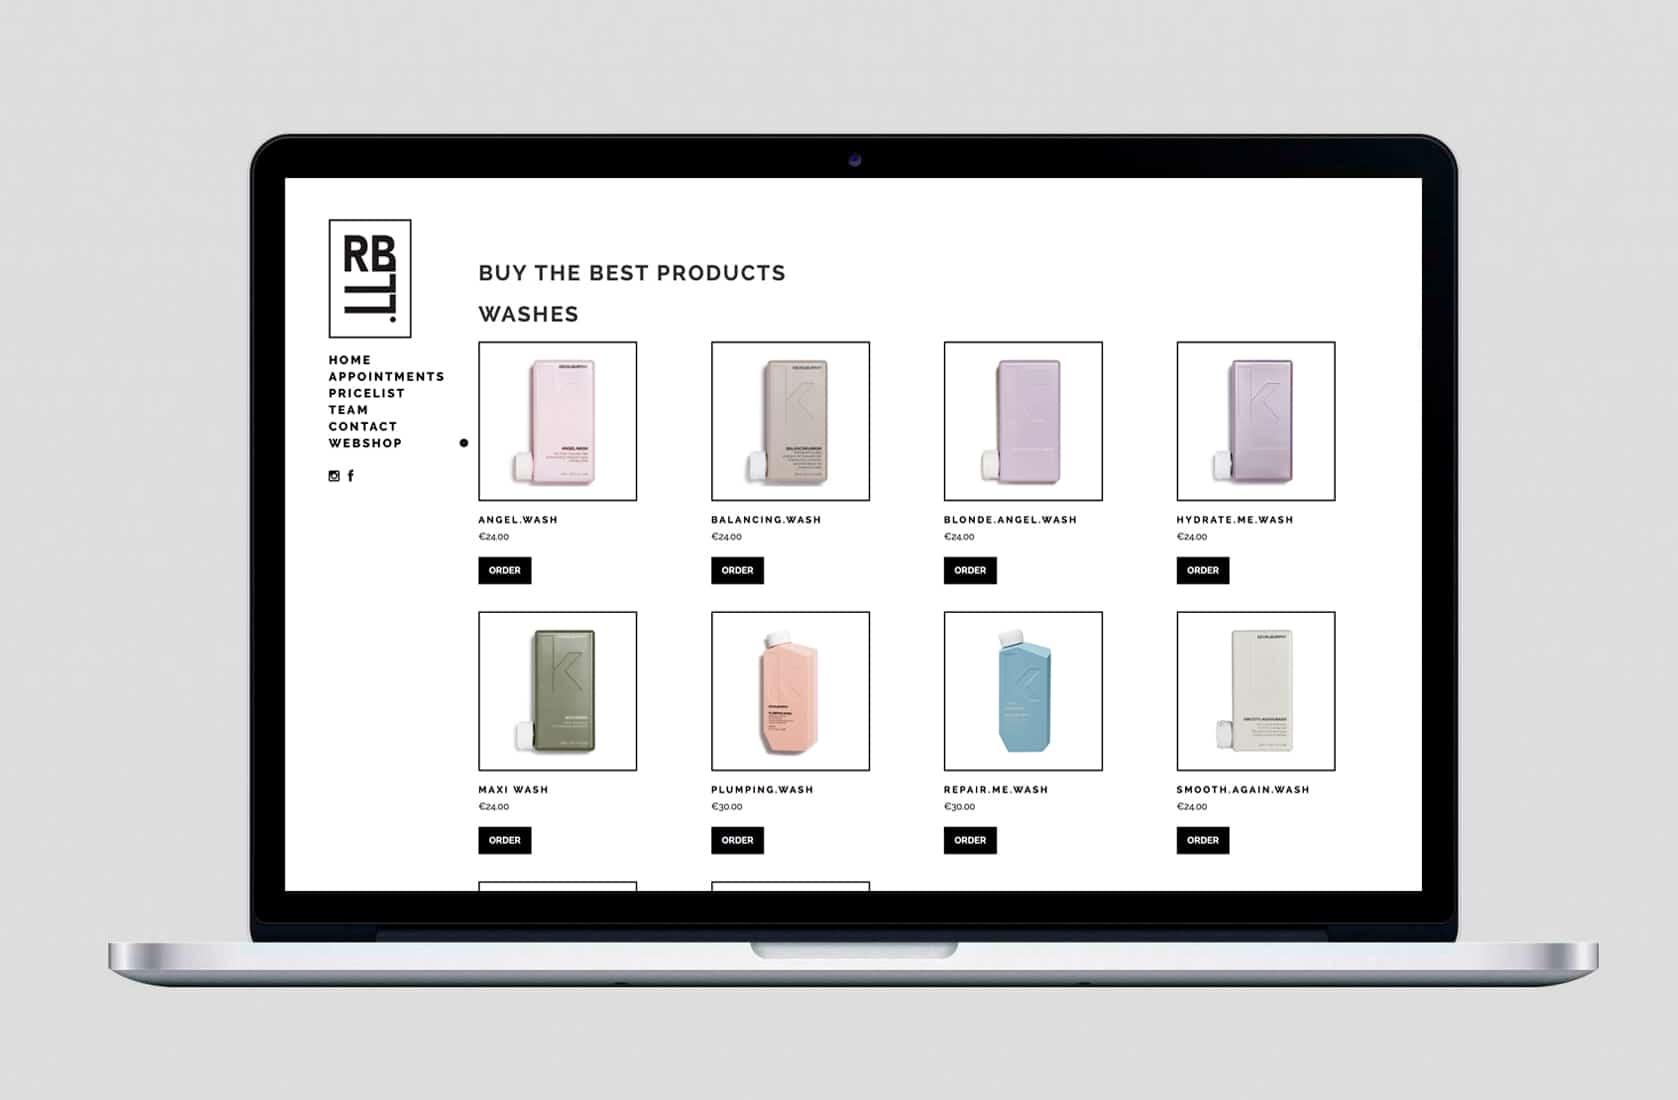 RBLL webshop